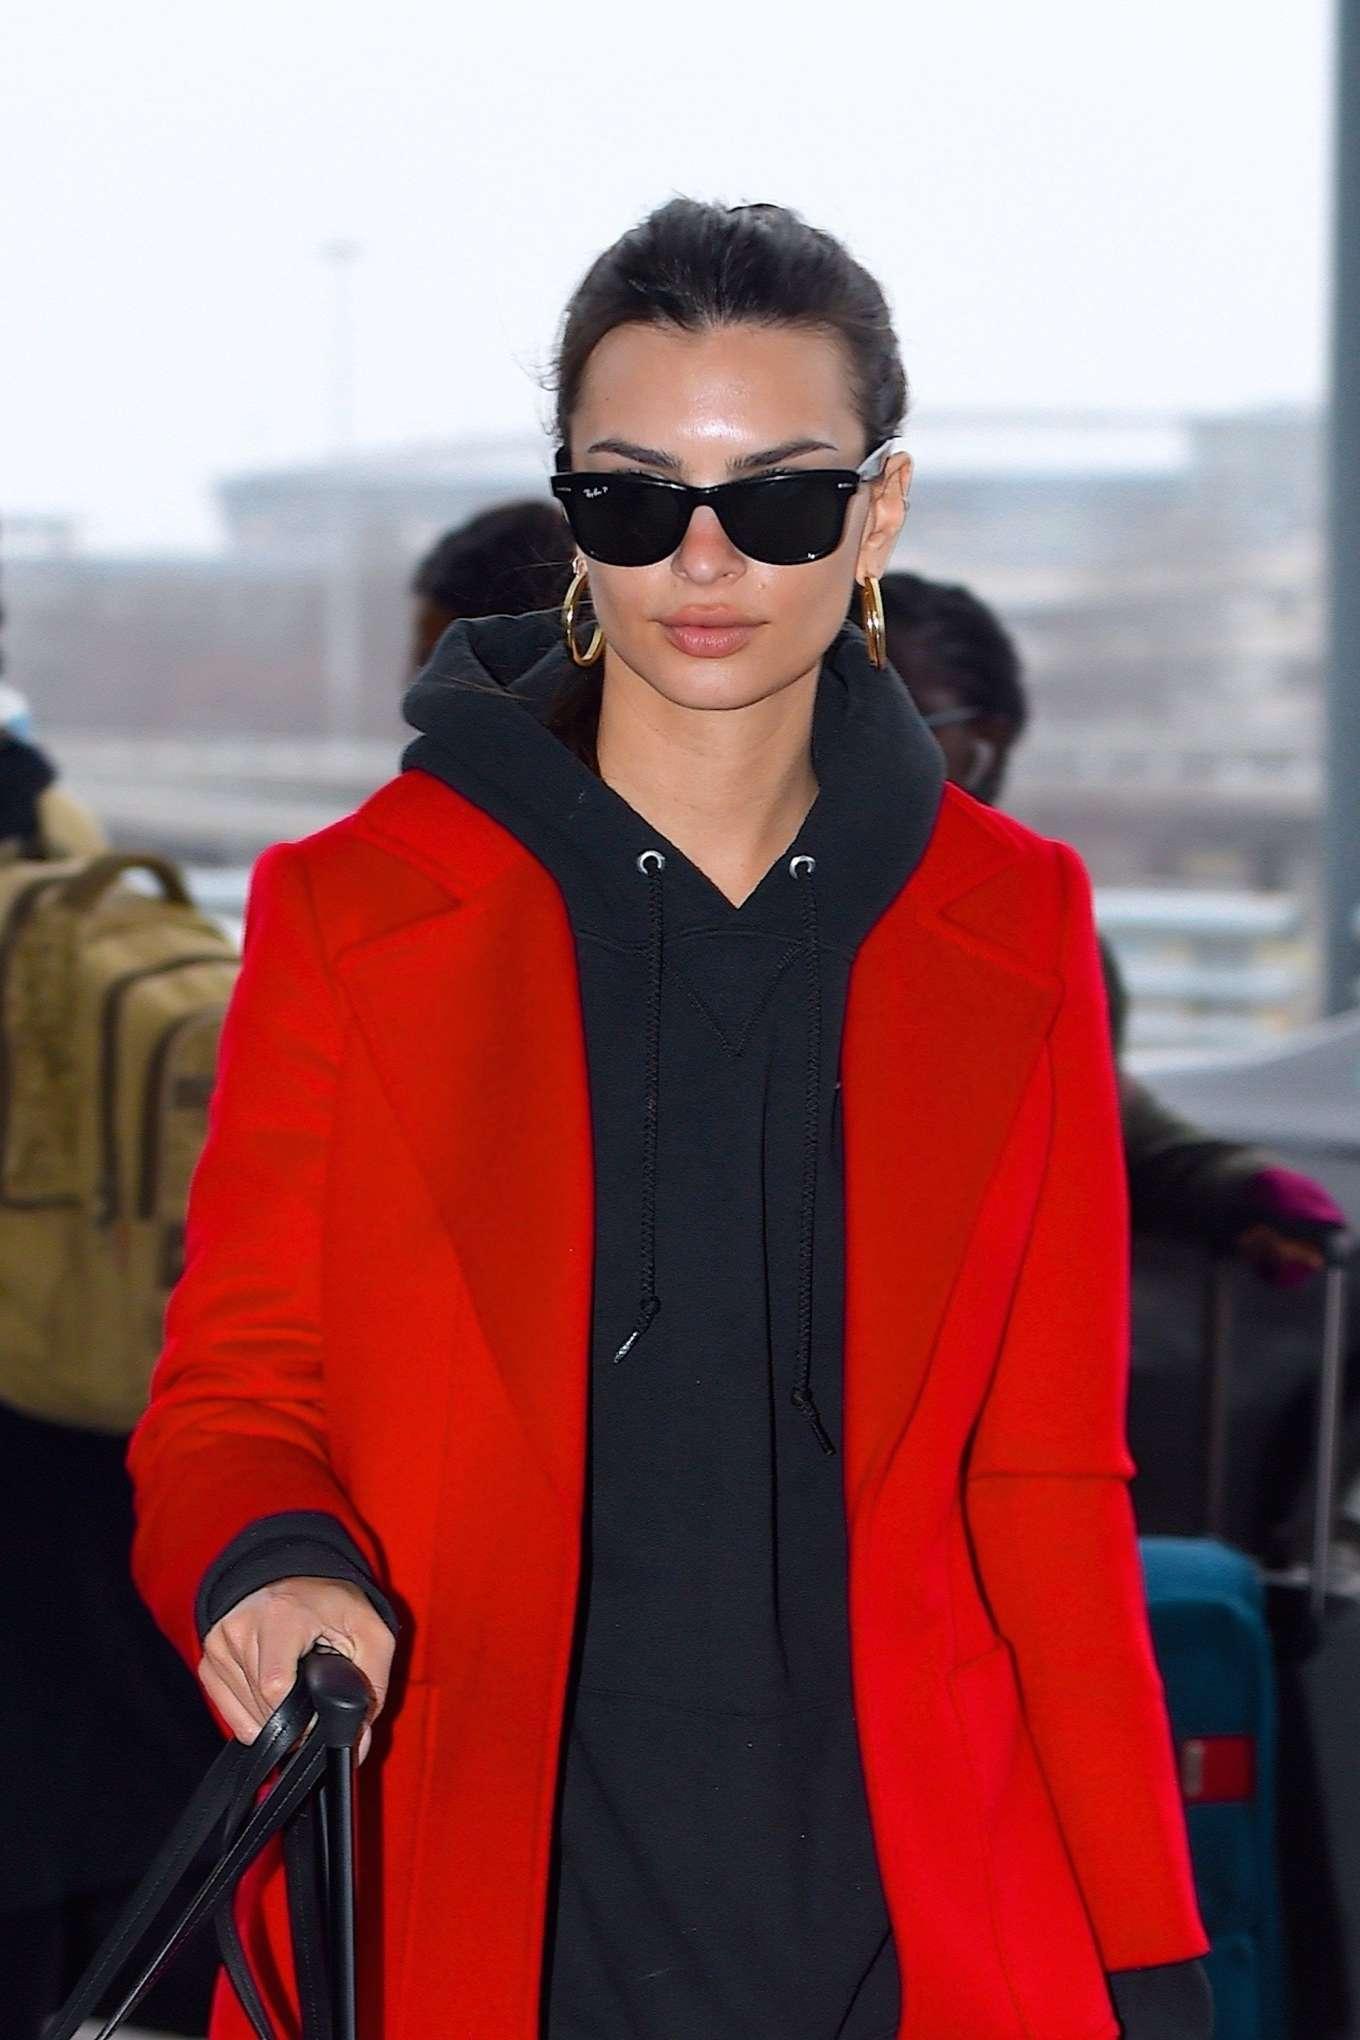 Emily Ratajkowski 2020 : Emily Ratajkowski in red coat ready for flight at JFK airport-01